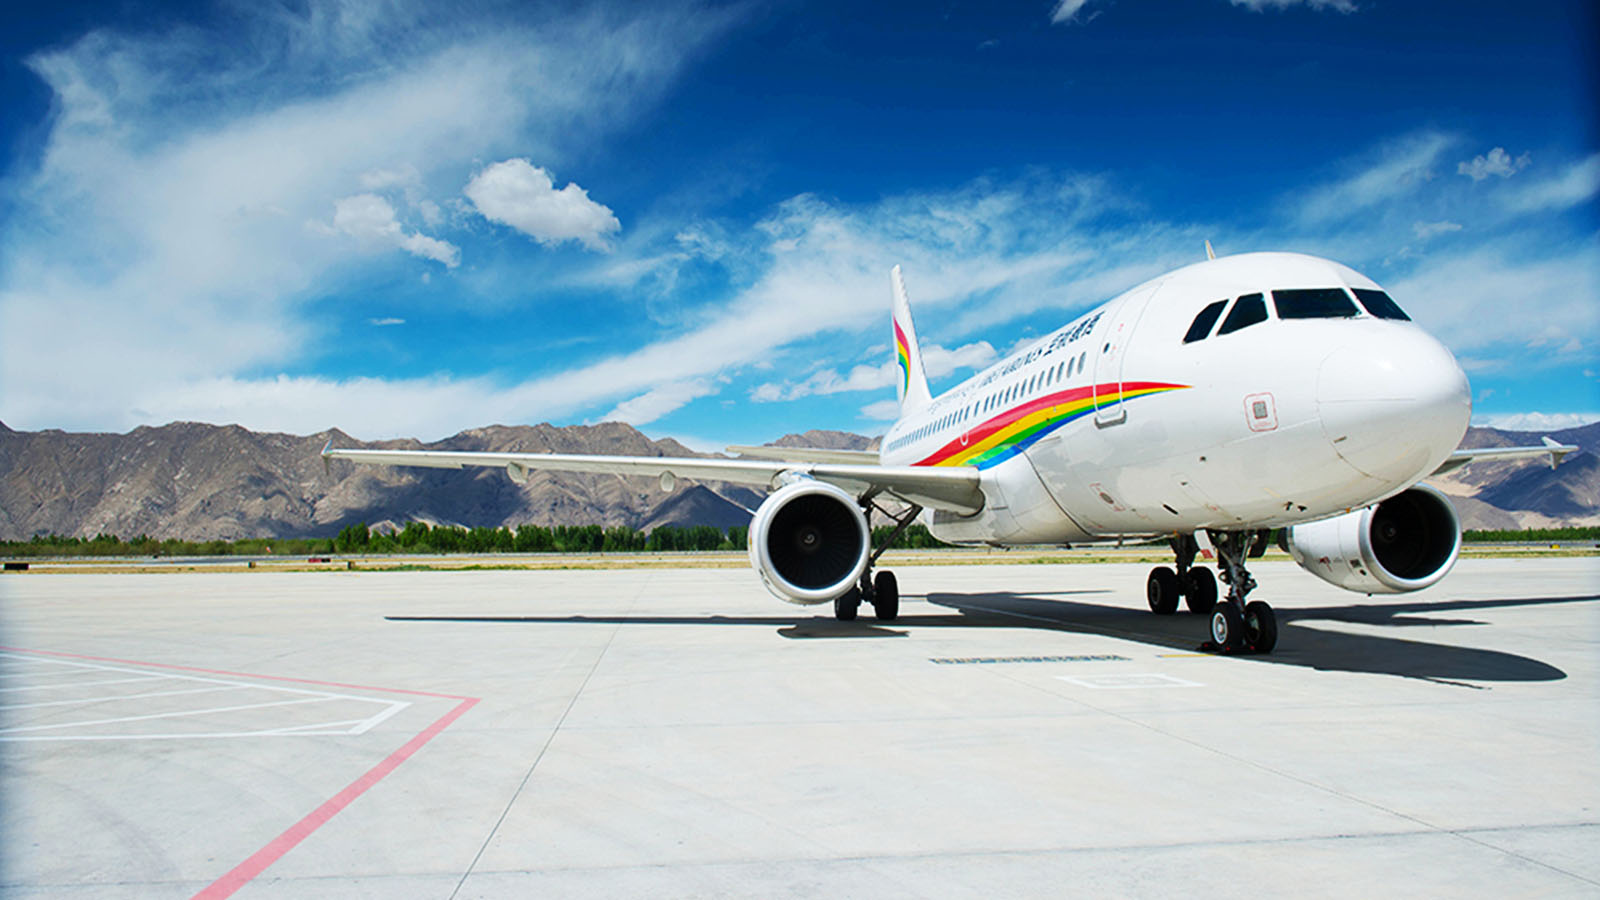 China's Tibet Airlines starts direct flight on Chengdu-Kathmandu route